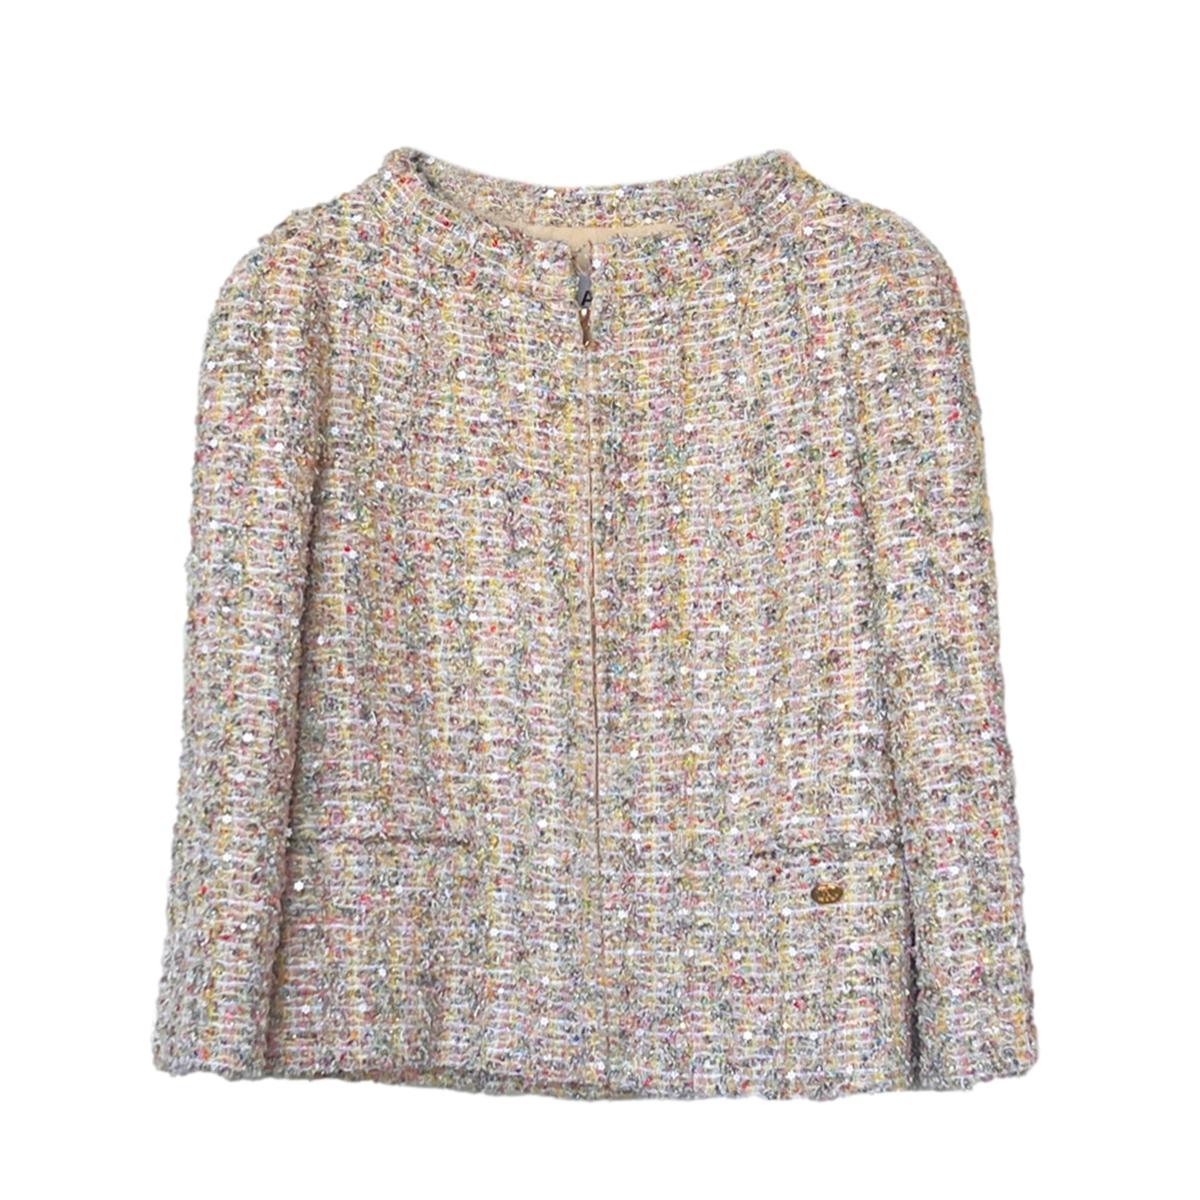 Chanel Embellished Multicoloured Lesage Tweed Jacket